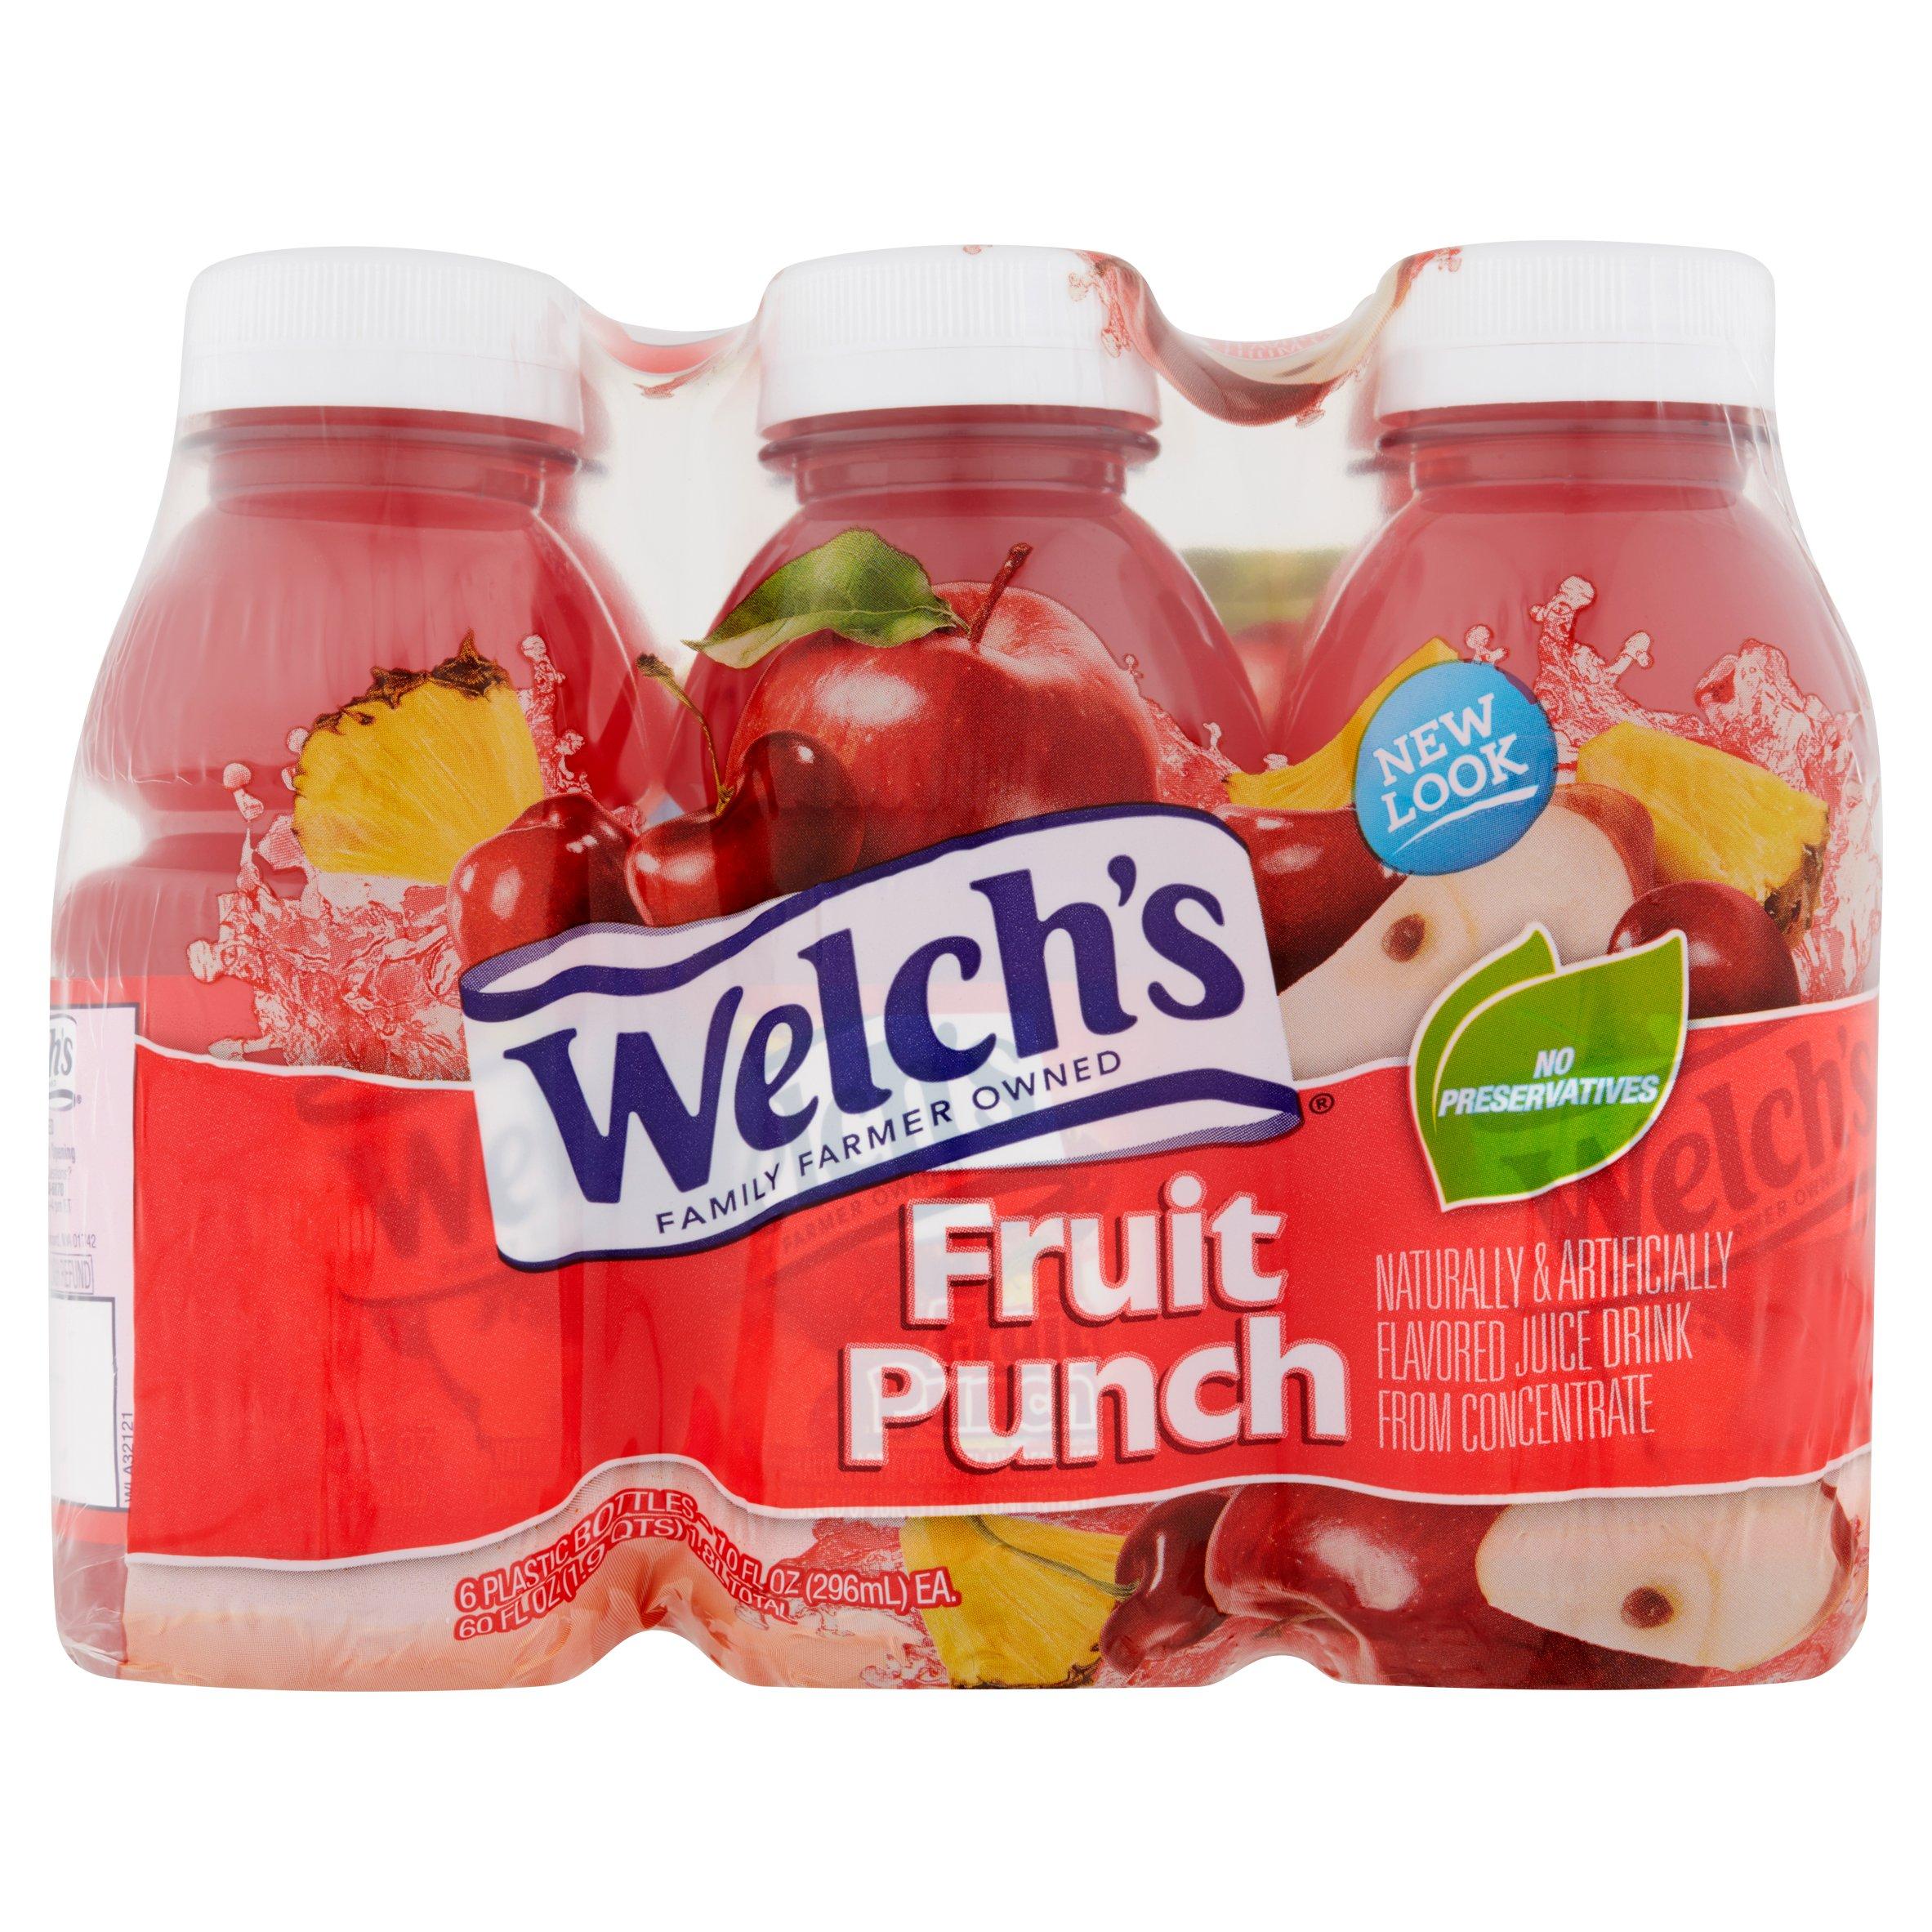 Welch's Juice, Fruit Punch, 10 Fl Oz, 6 Count - Walmart.com